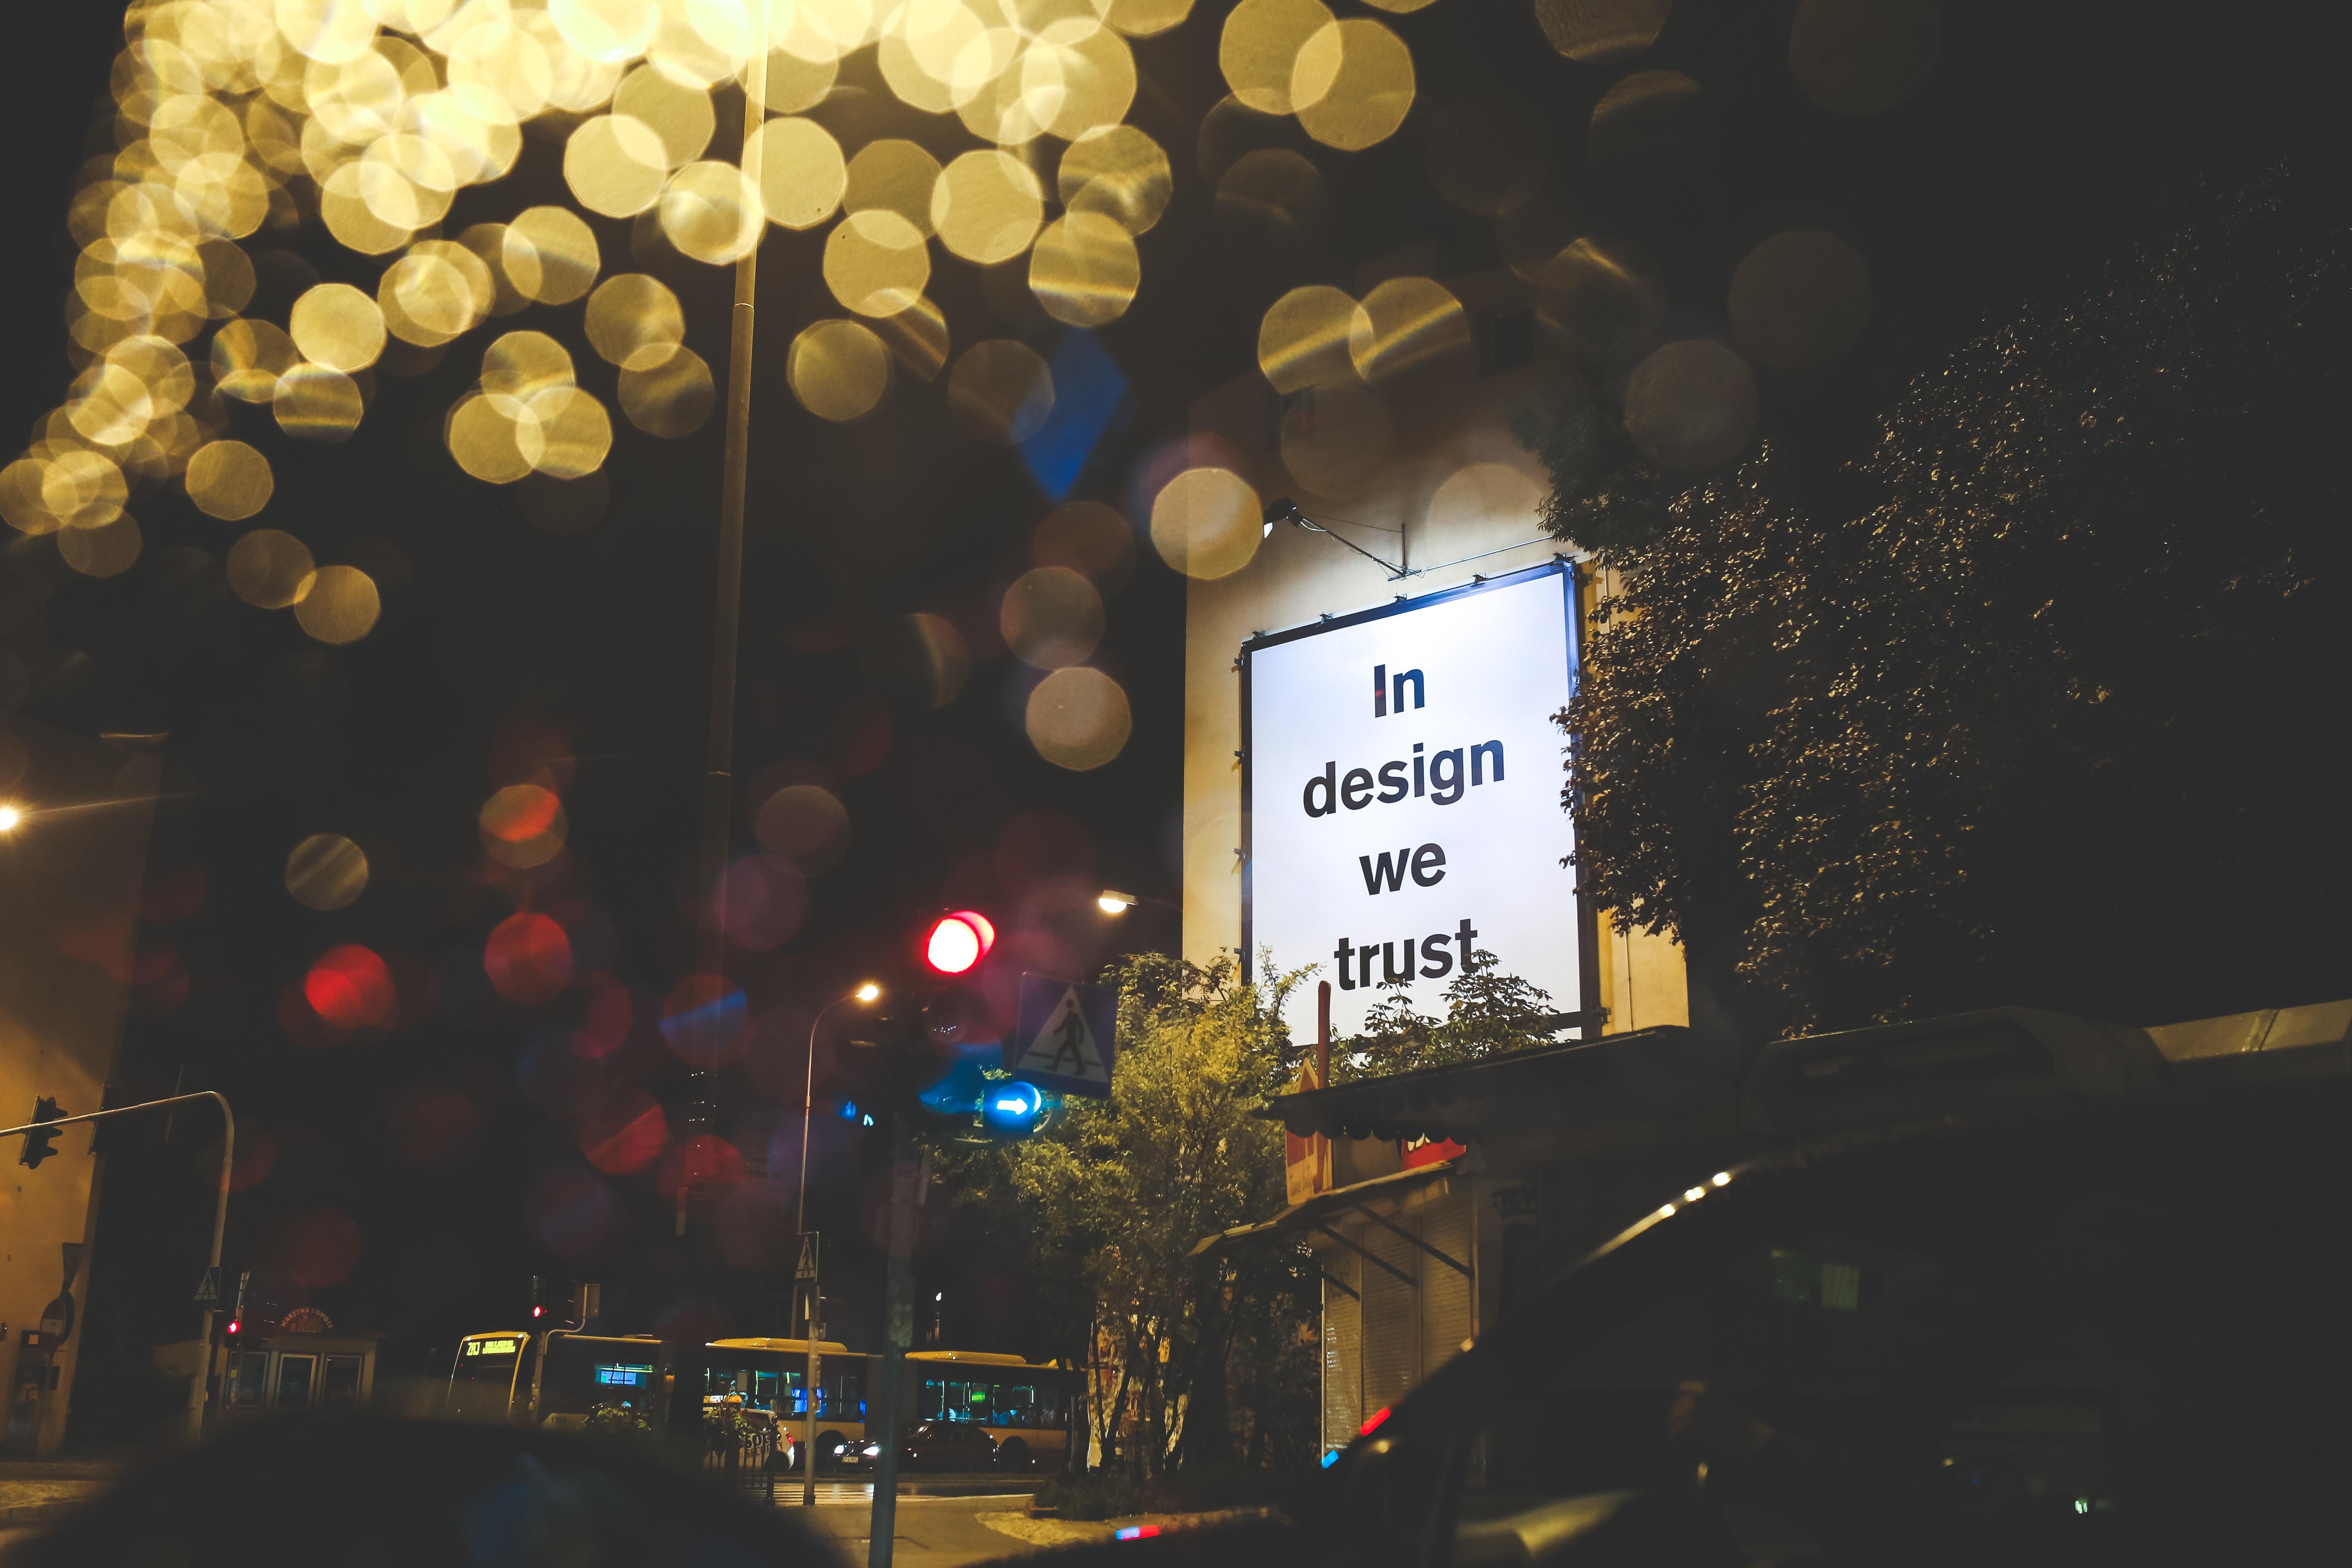 In design we trust / billboard photo